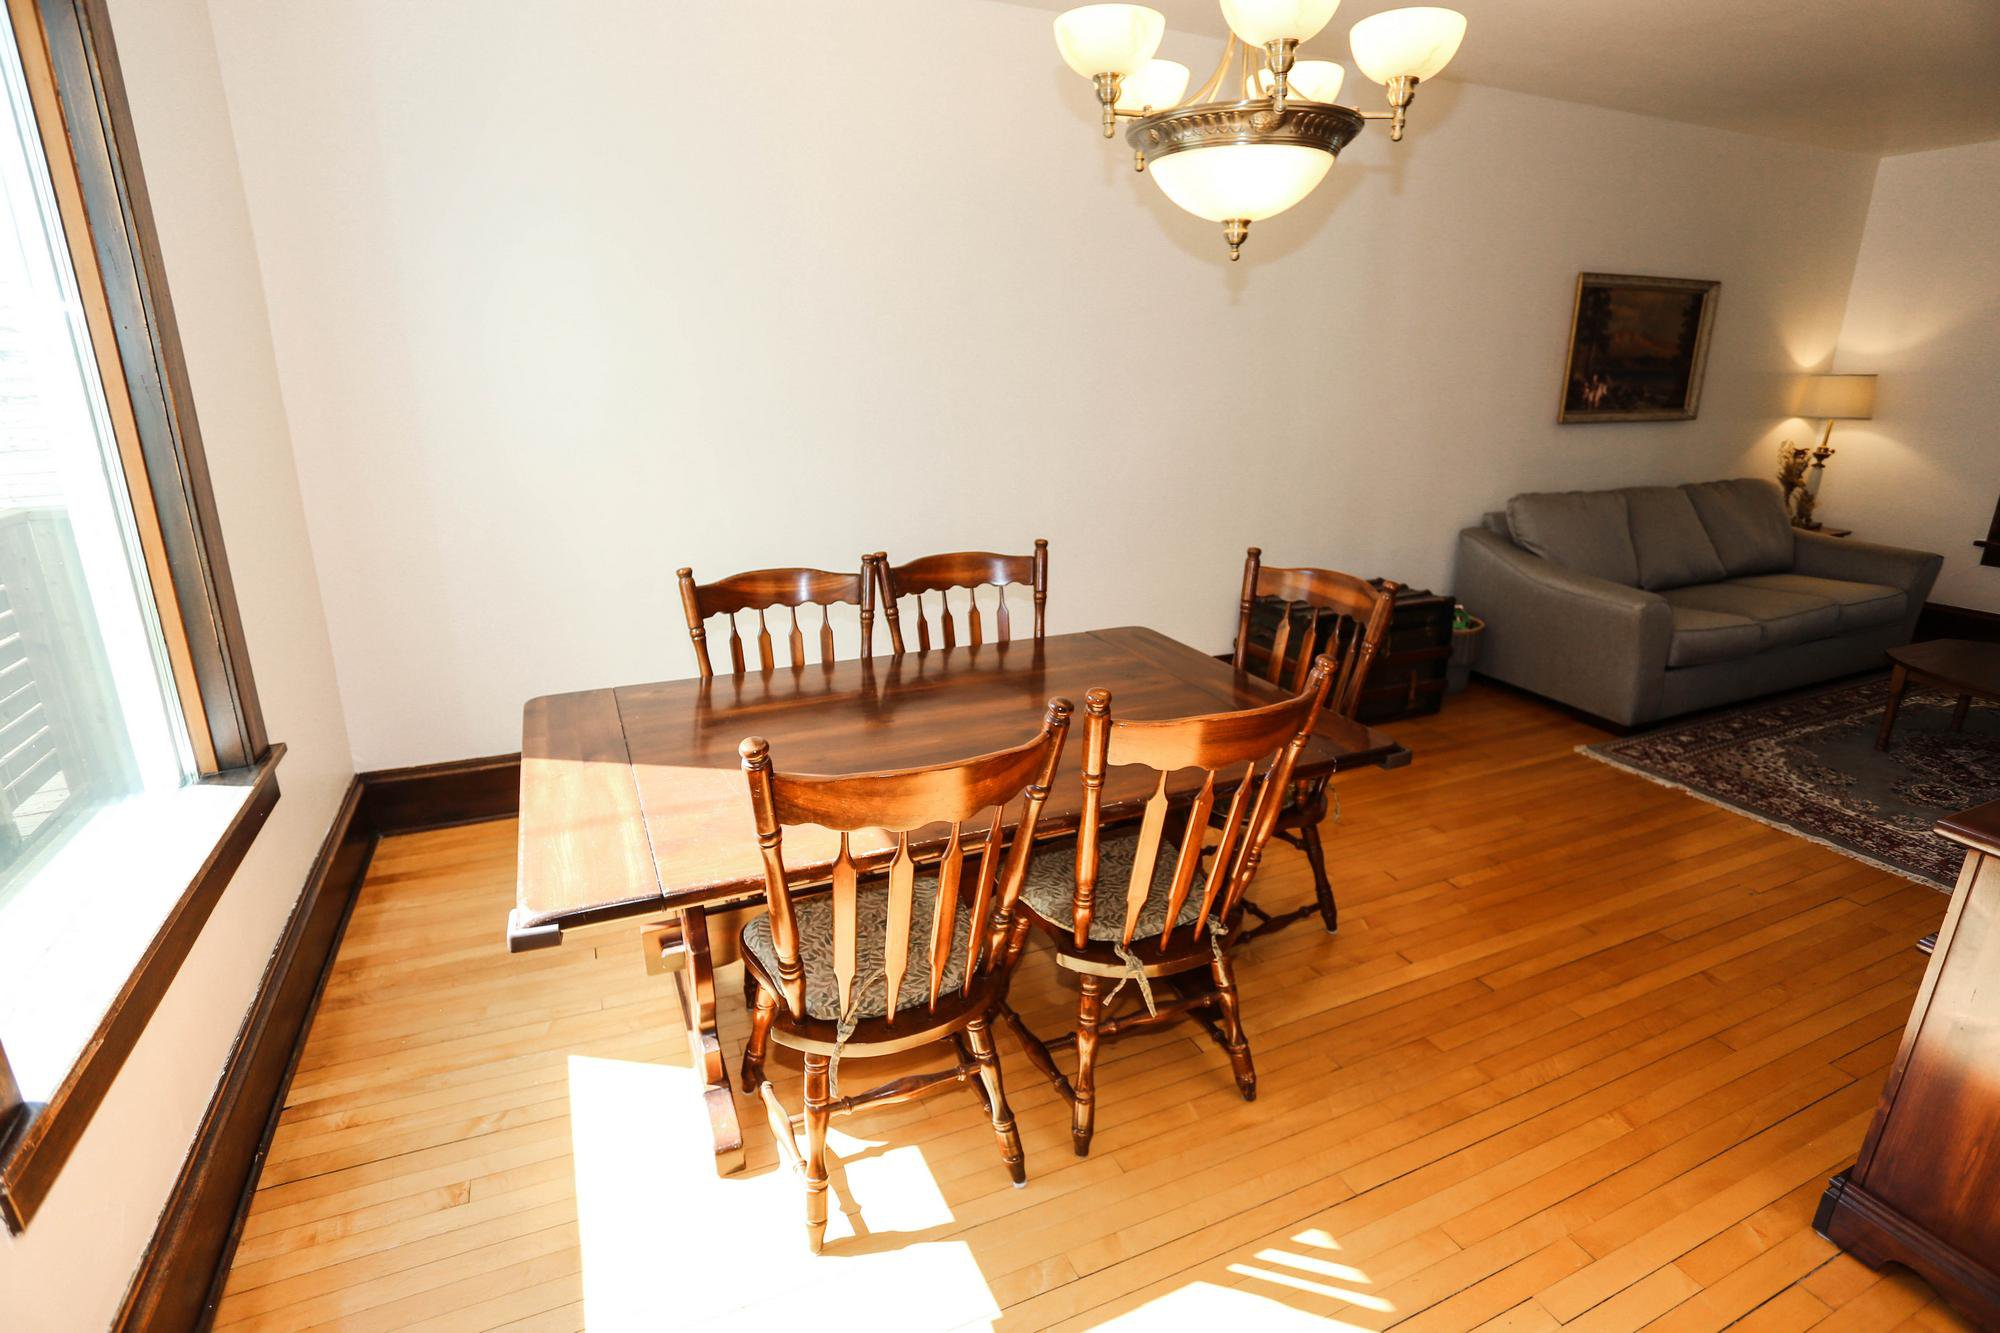 Photo 11: Photos: 105 Evanson Street in Winnipeg: Wolseley Single Family Detached for sale (5B)  : MLS®# 1821900